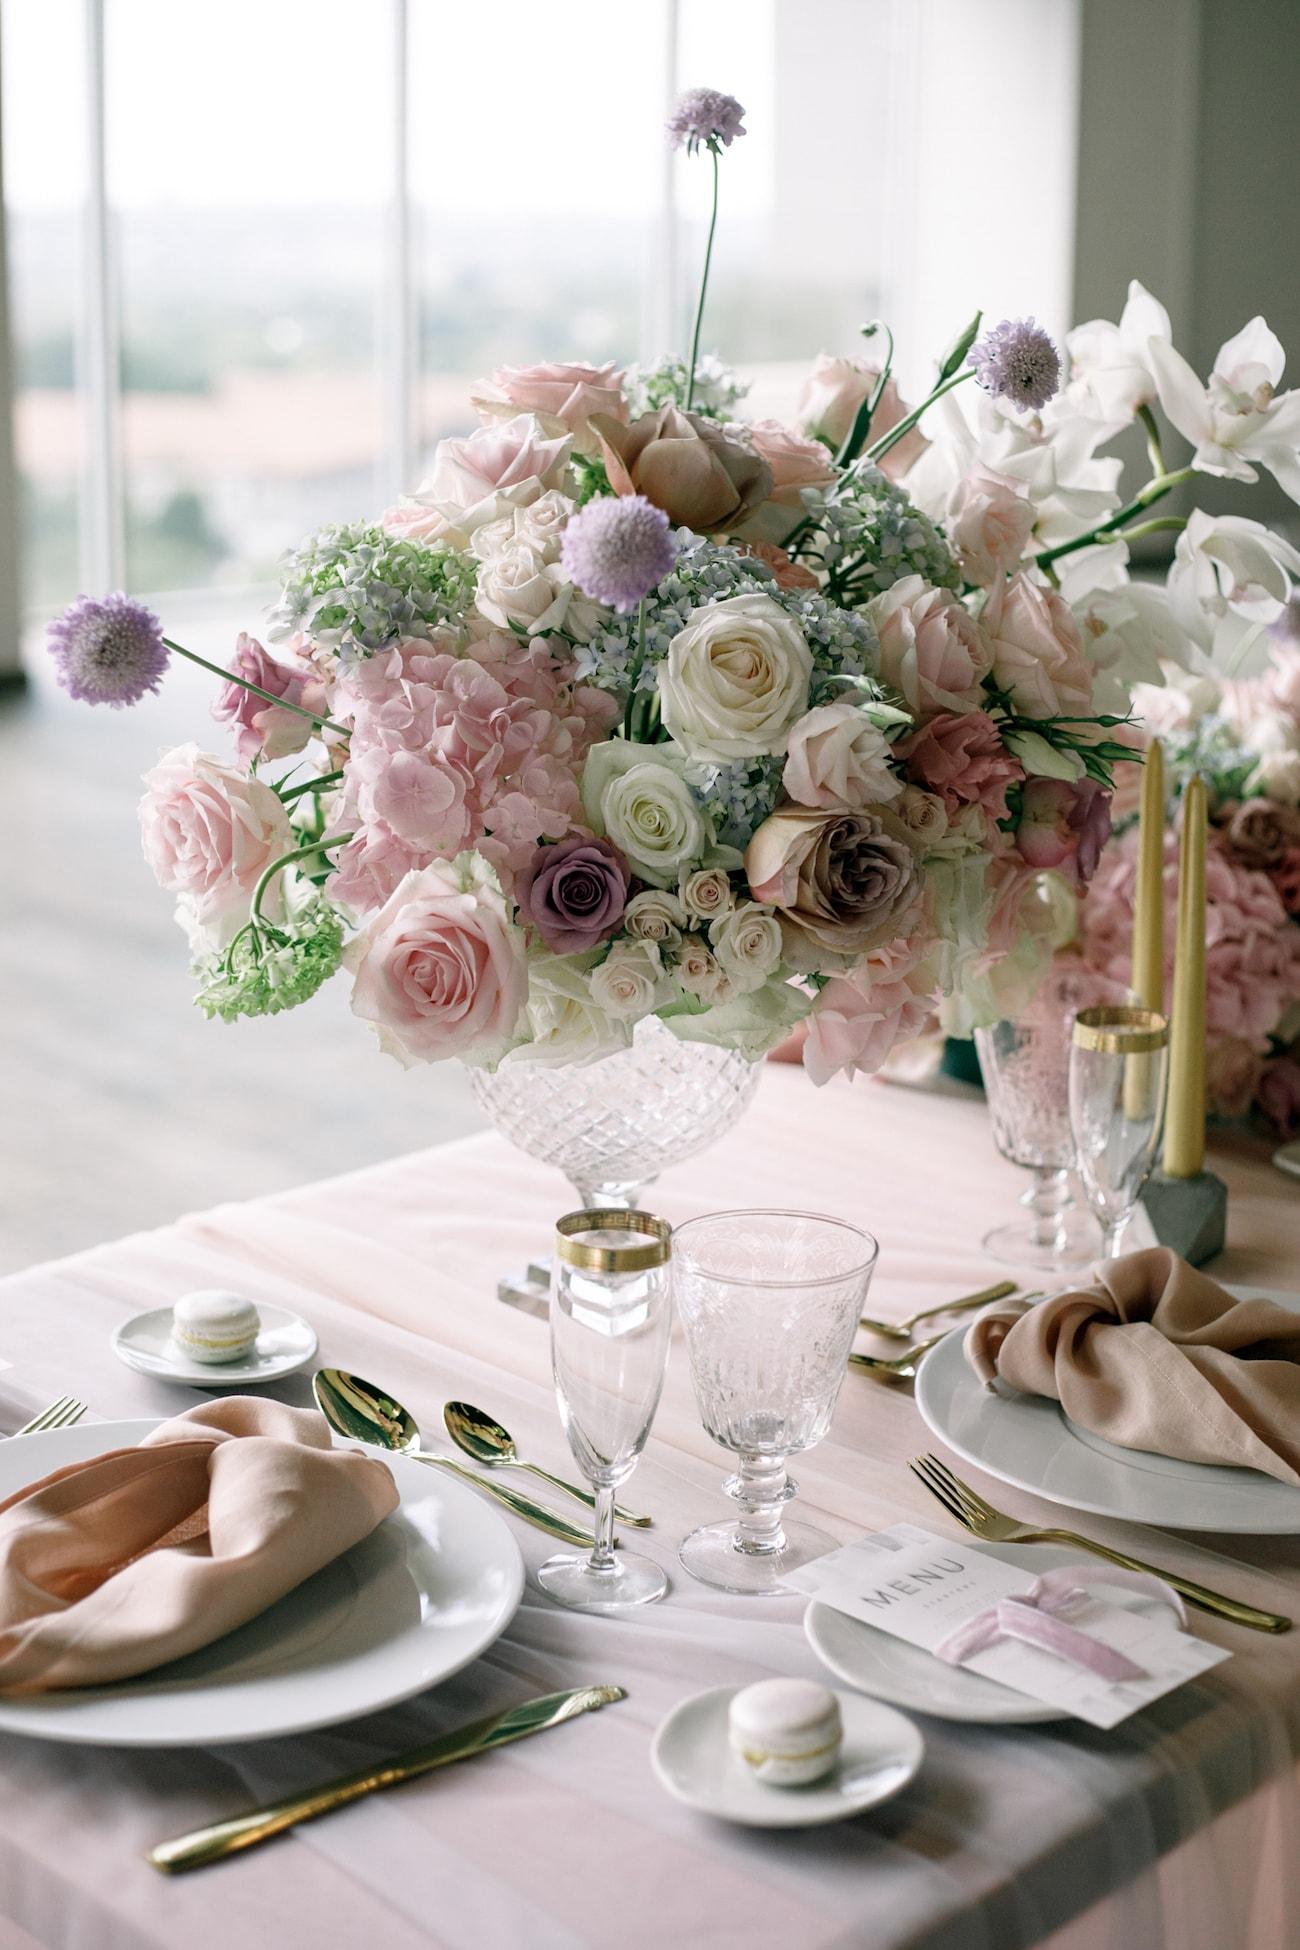 Romantic Iridescent Wedding Table Decor | Credit: Jessica Notelo (18)